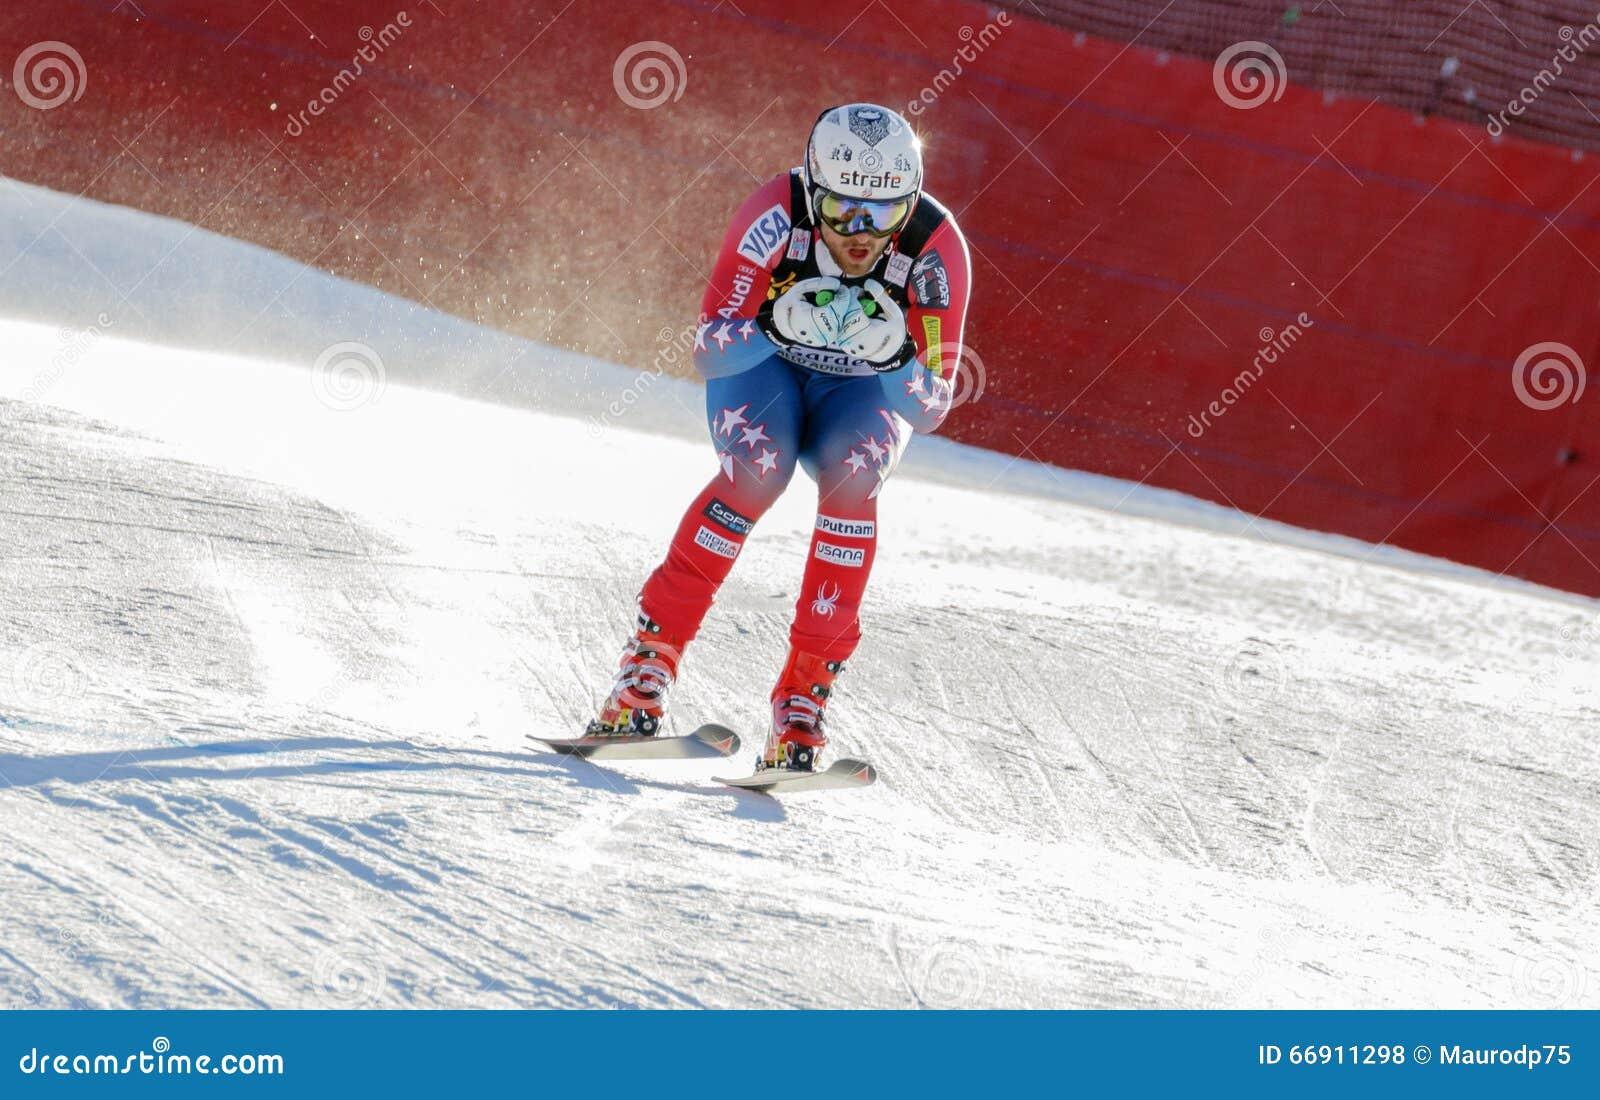 LÖNN Wiley i Audi FIS alpina Ski World Cup - mäns sluttande rommar